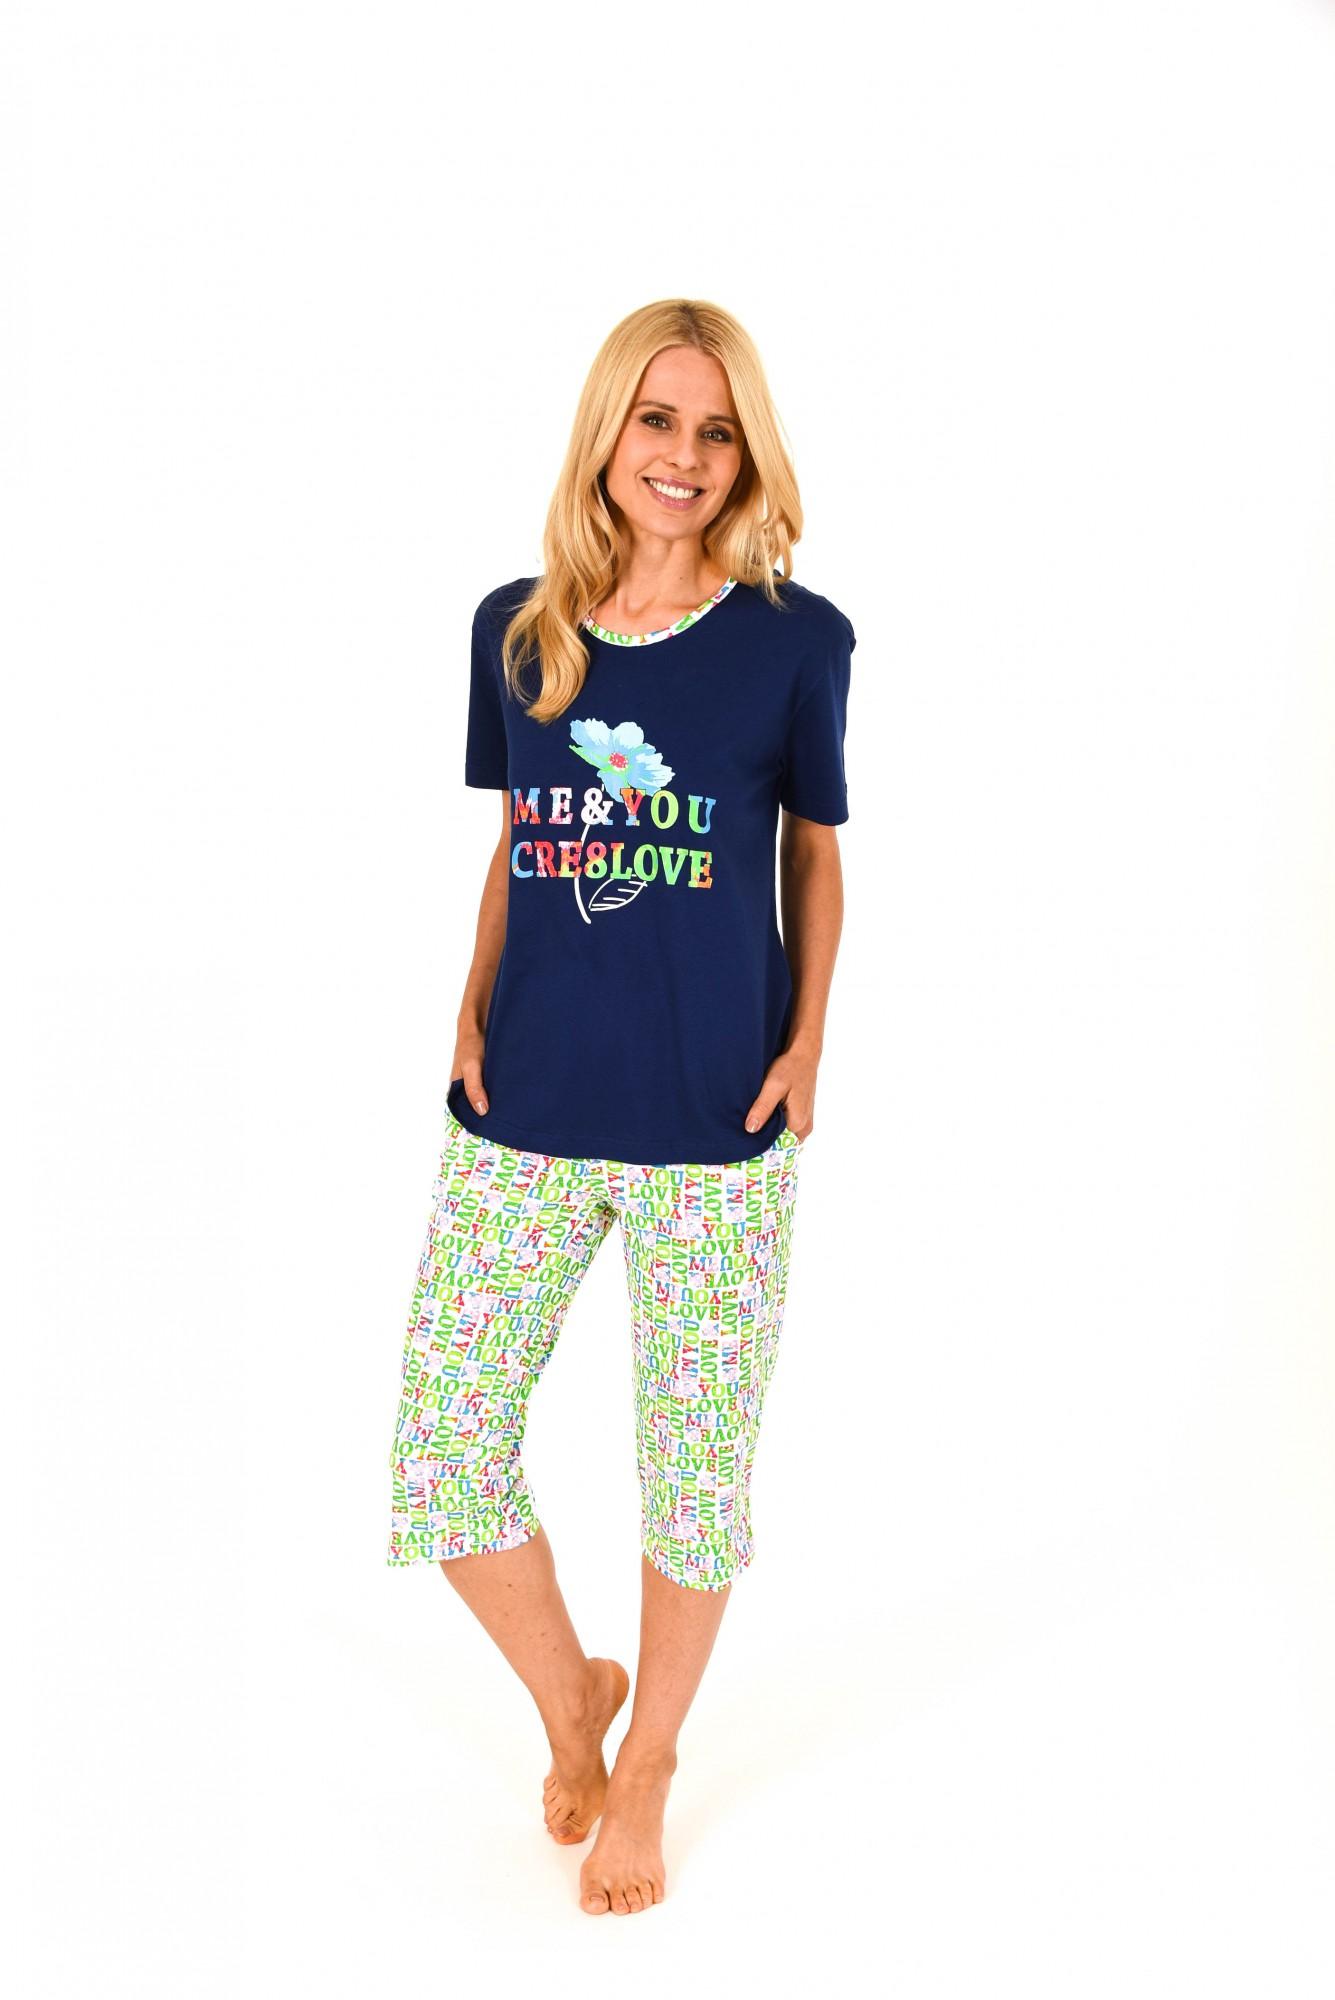 Wunderschöner Damen Pyjama kurzarm mit Caprihose – 171 204 90 842